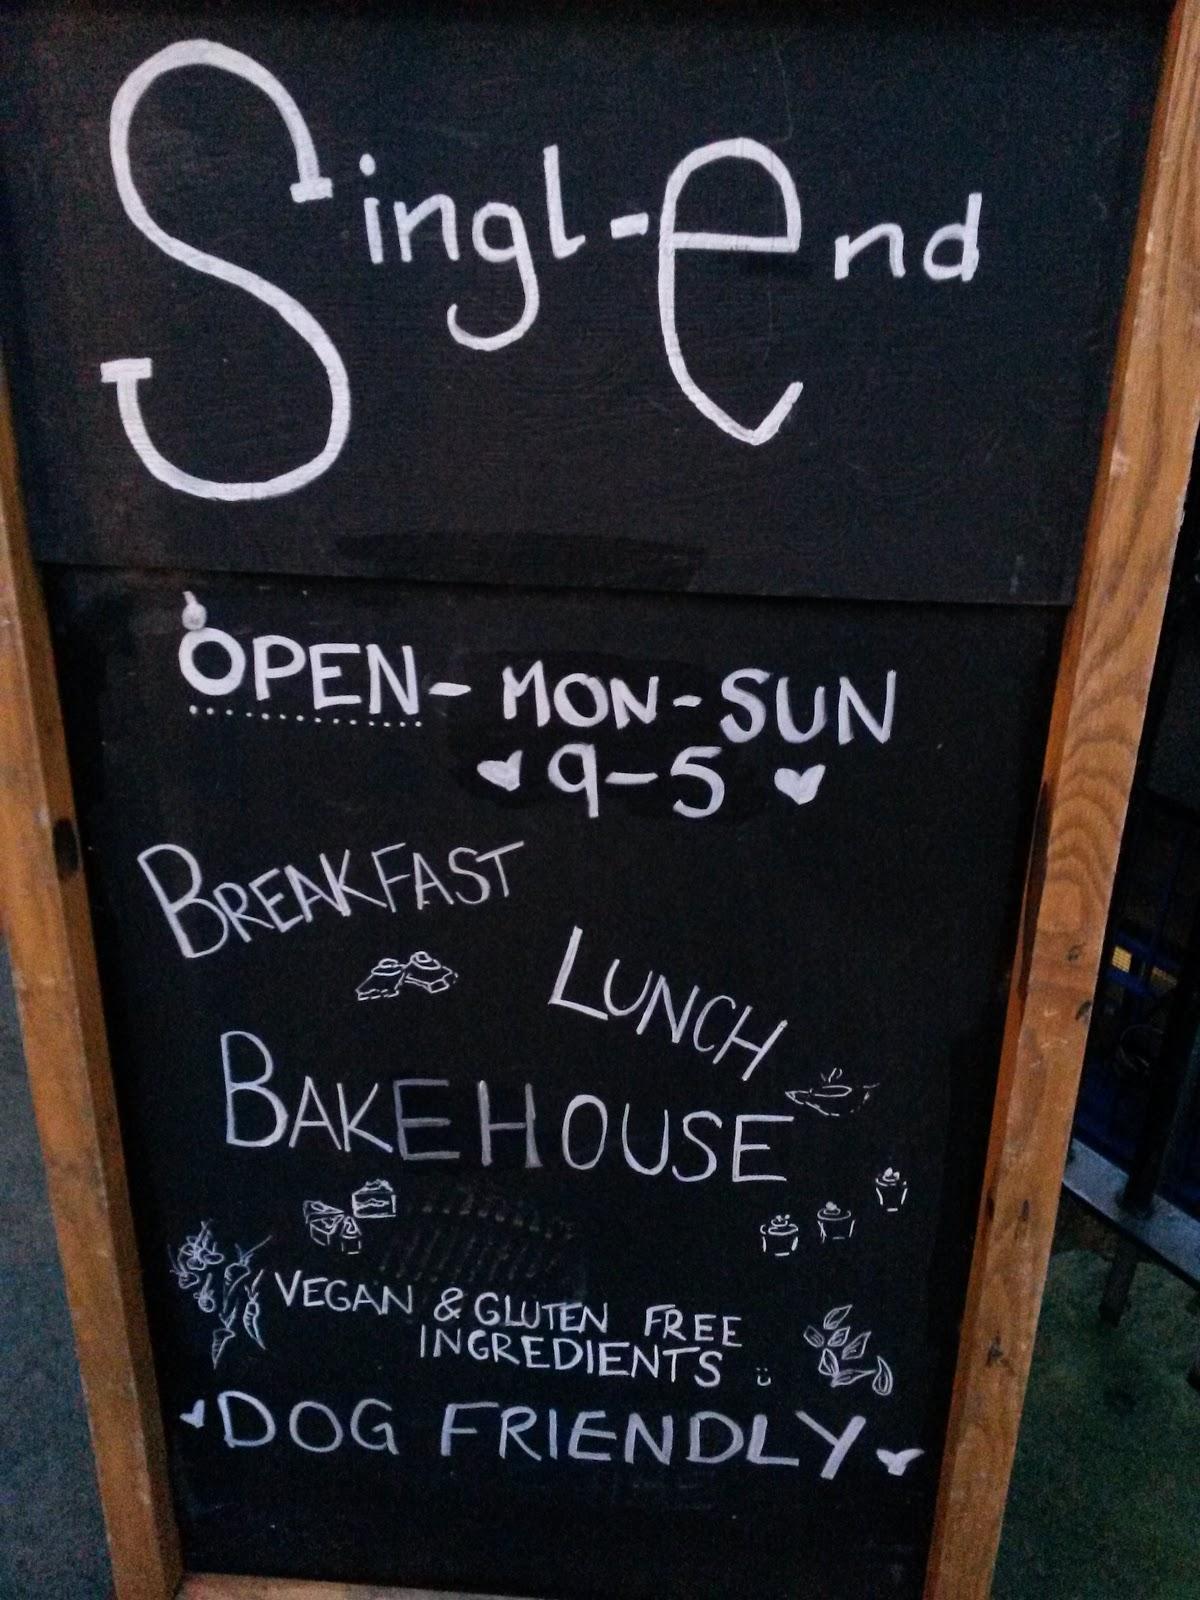 Singl End Cafe And Bakehouse Menu